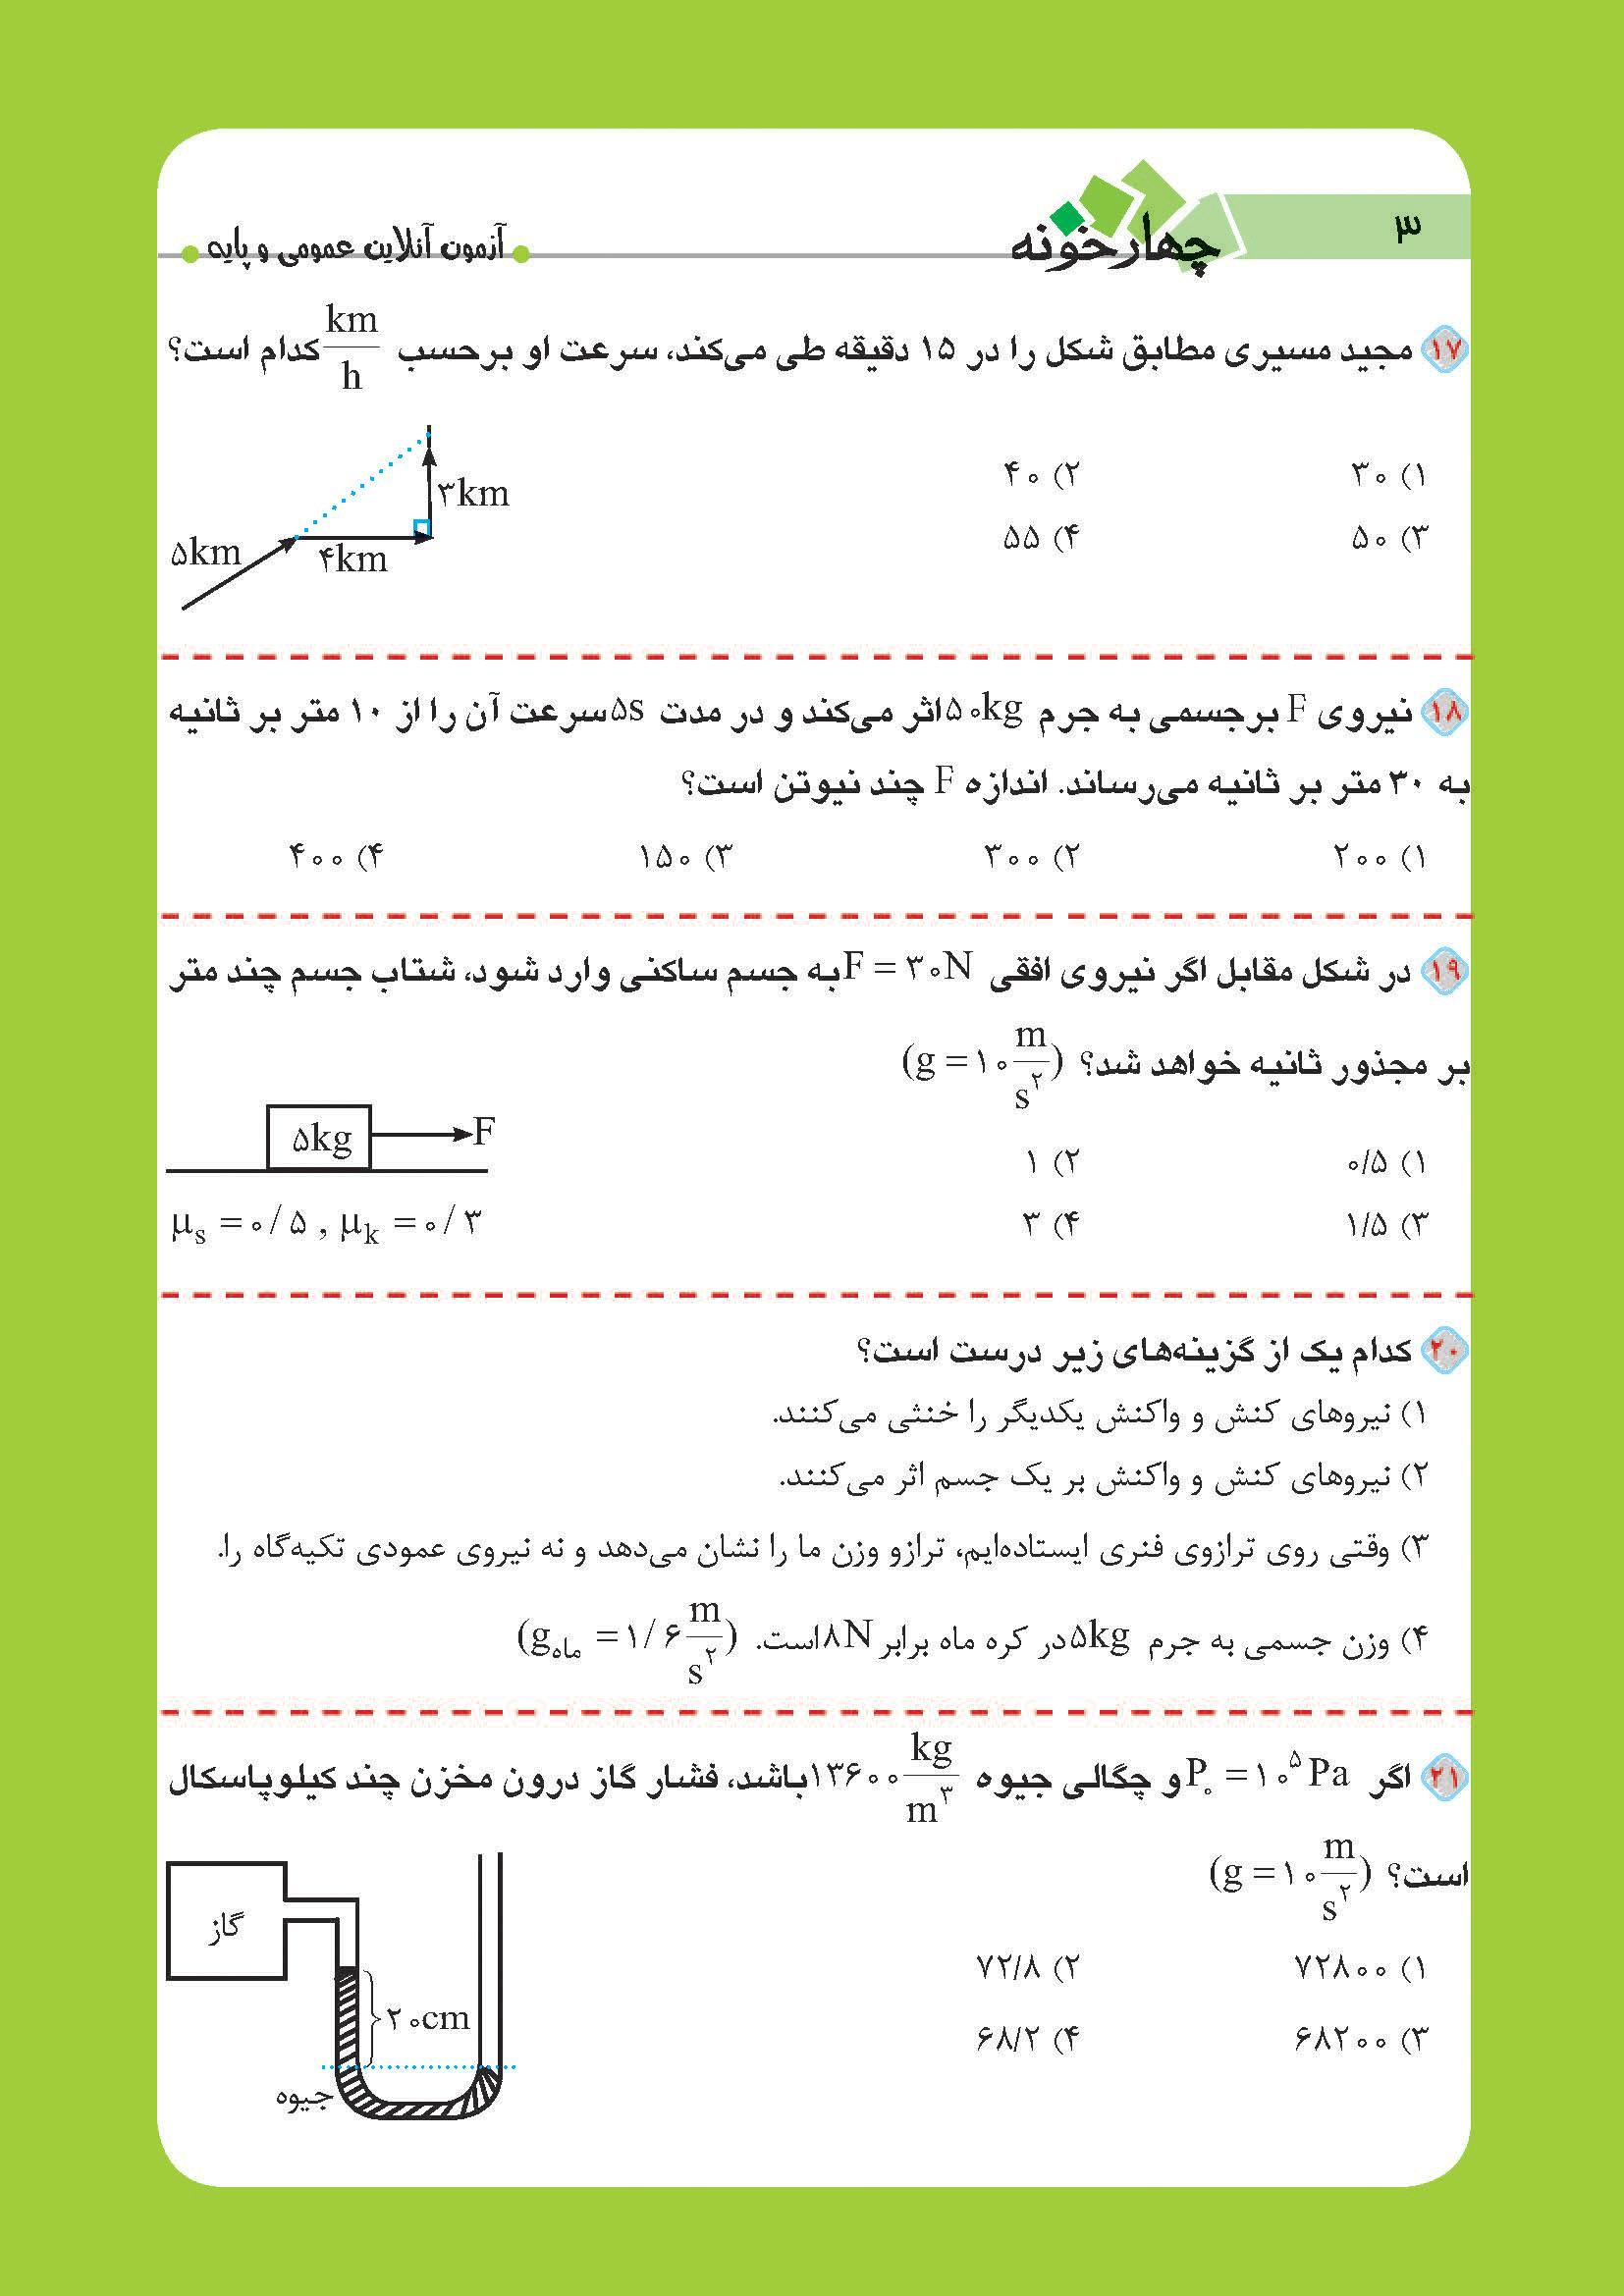 آزمون آنلاین جامع مکانیک